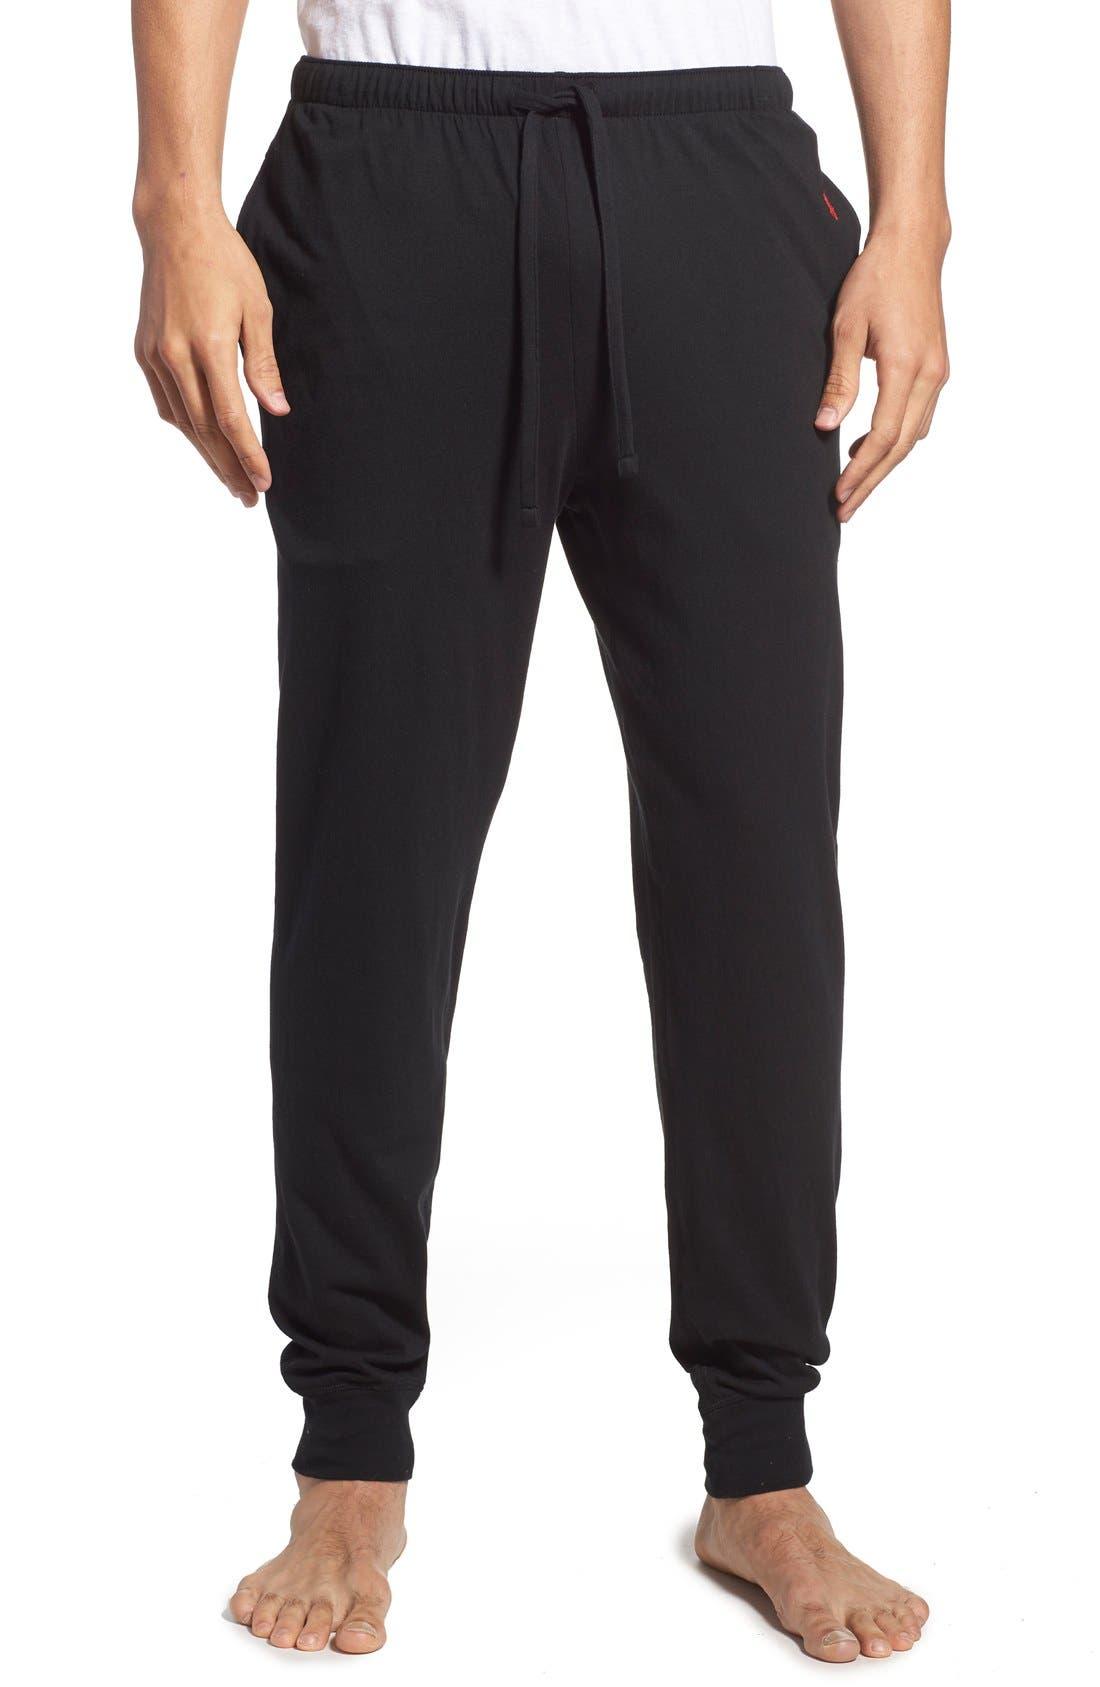 POLO RALPH LAUREN, Relaxed Fit Cotton Knit Lounge Jogger Pants, Main thumbnail 1, color, BLACK